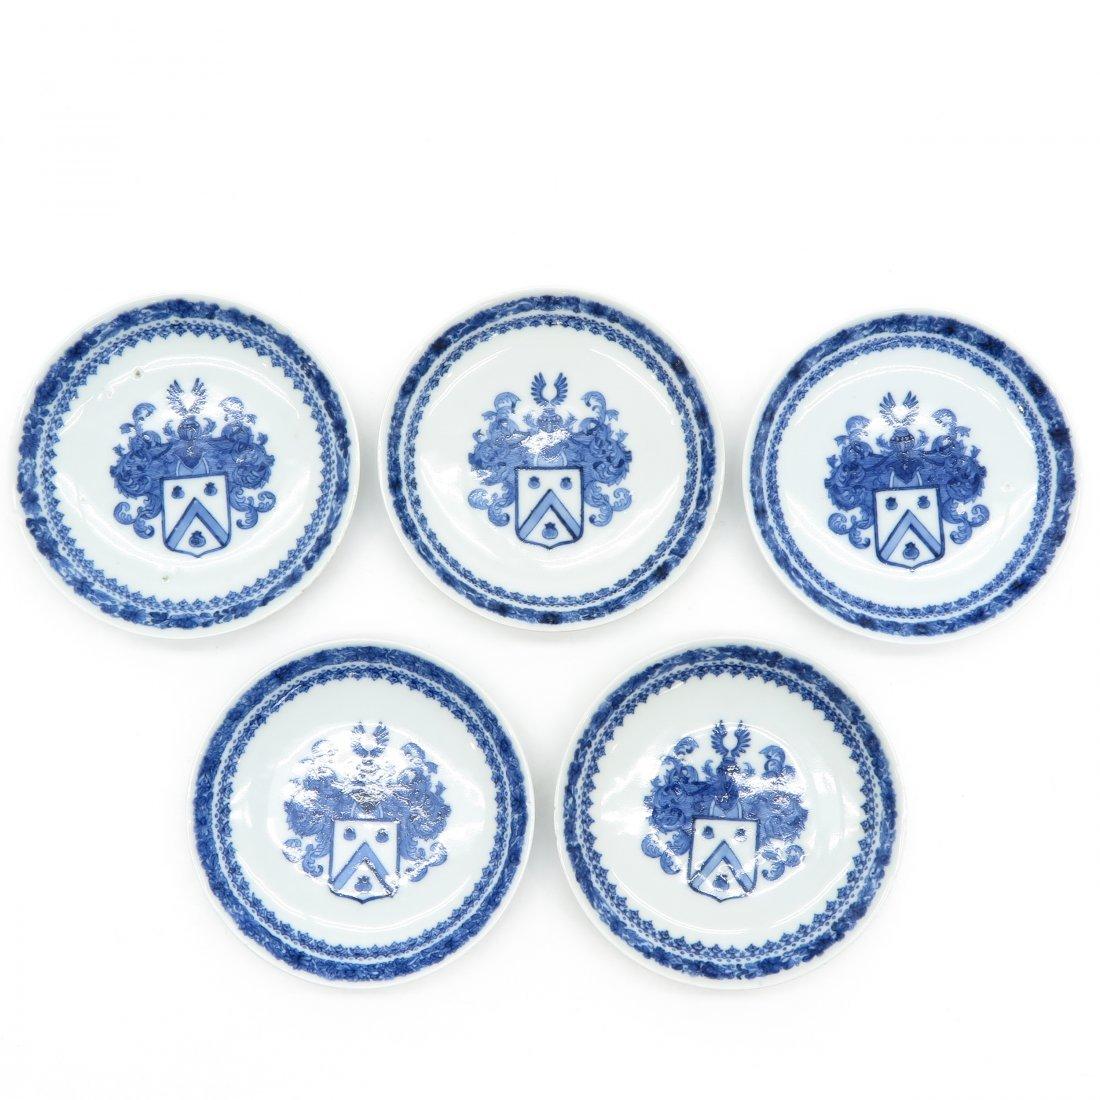 Lot of 18th Century Chine De Commande Plates